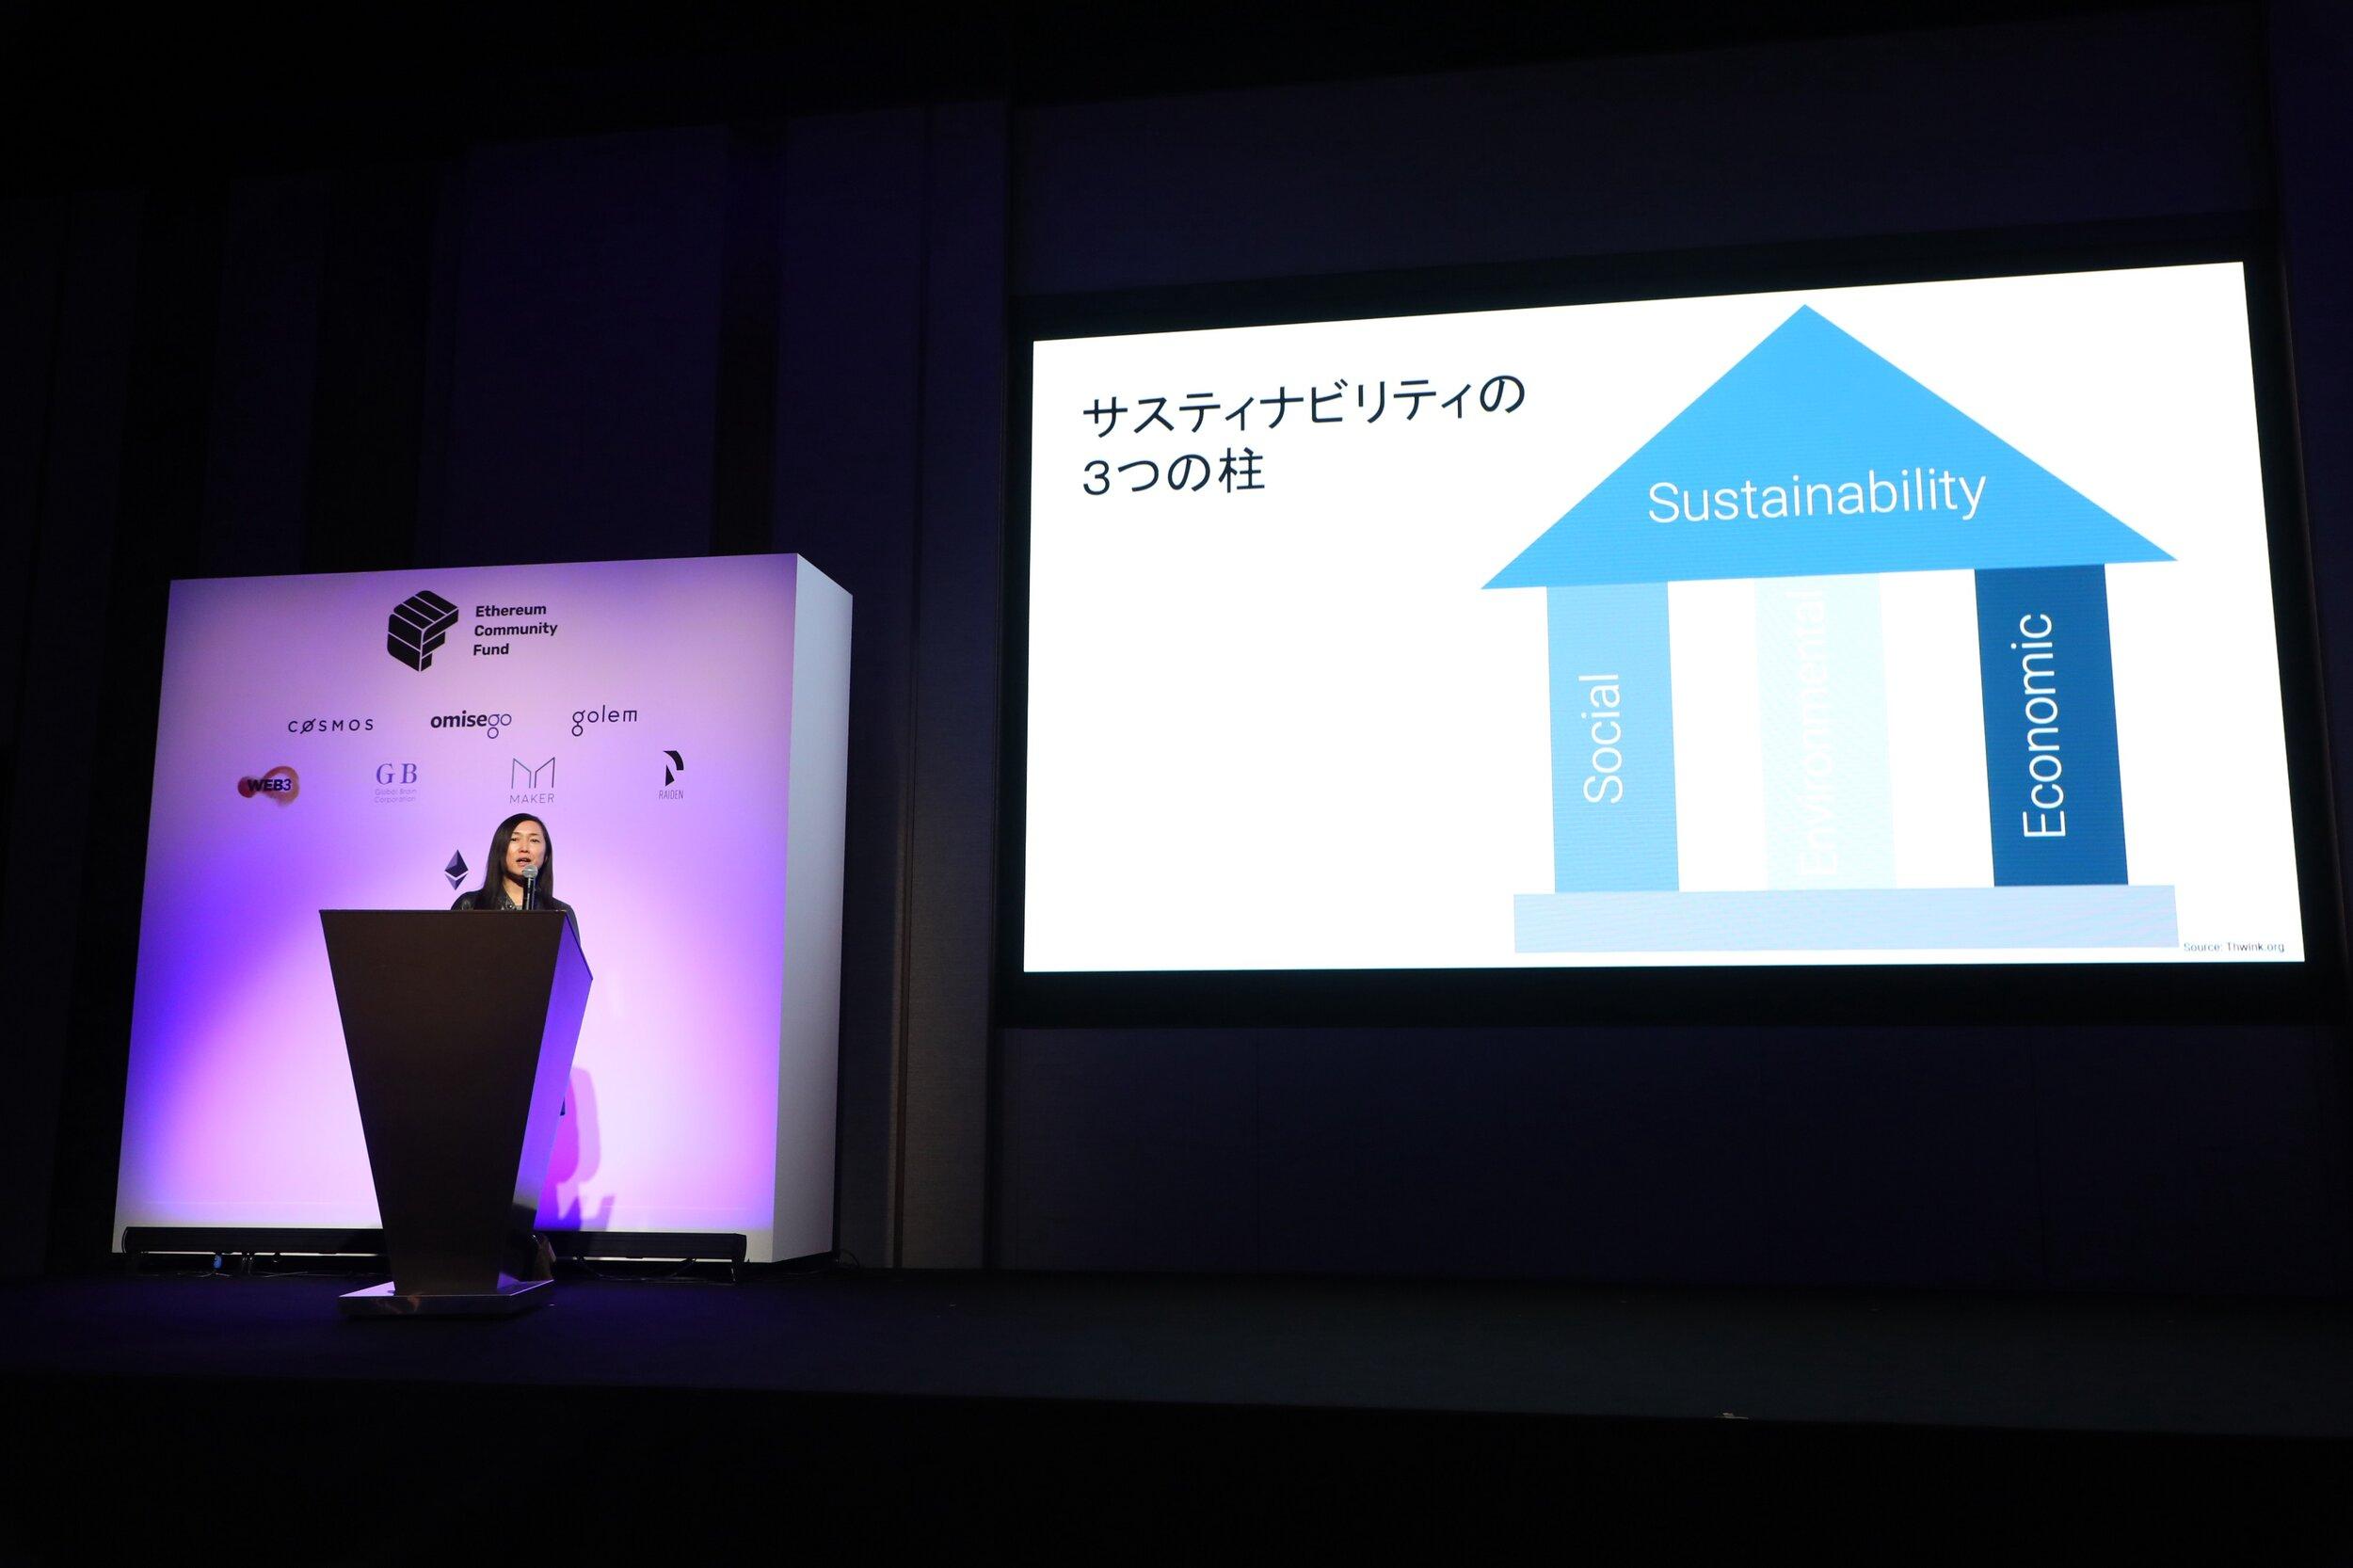 Aya Miyaguchi - Executive Director, Ethereum Foundation